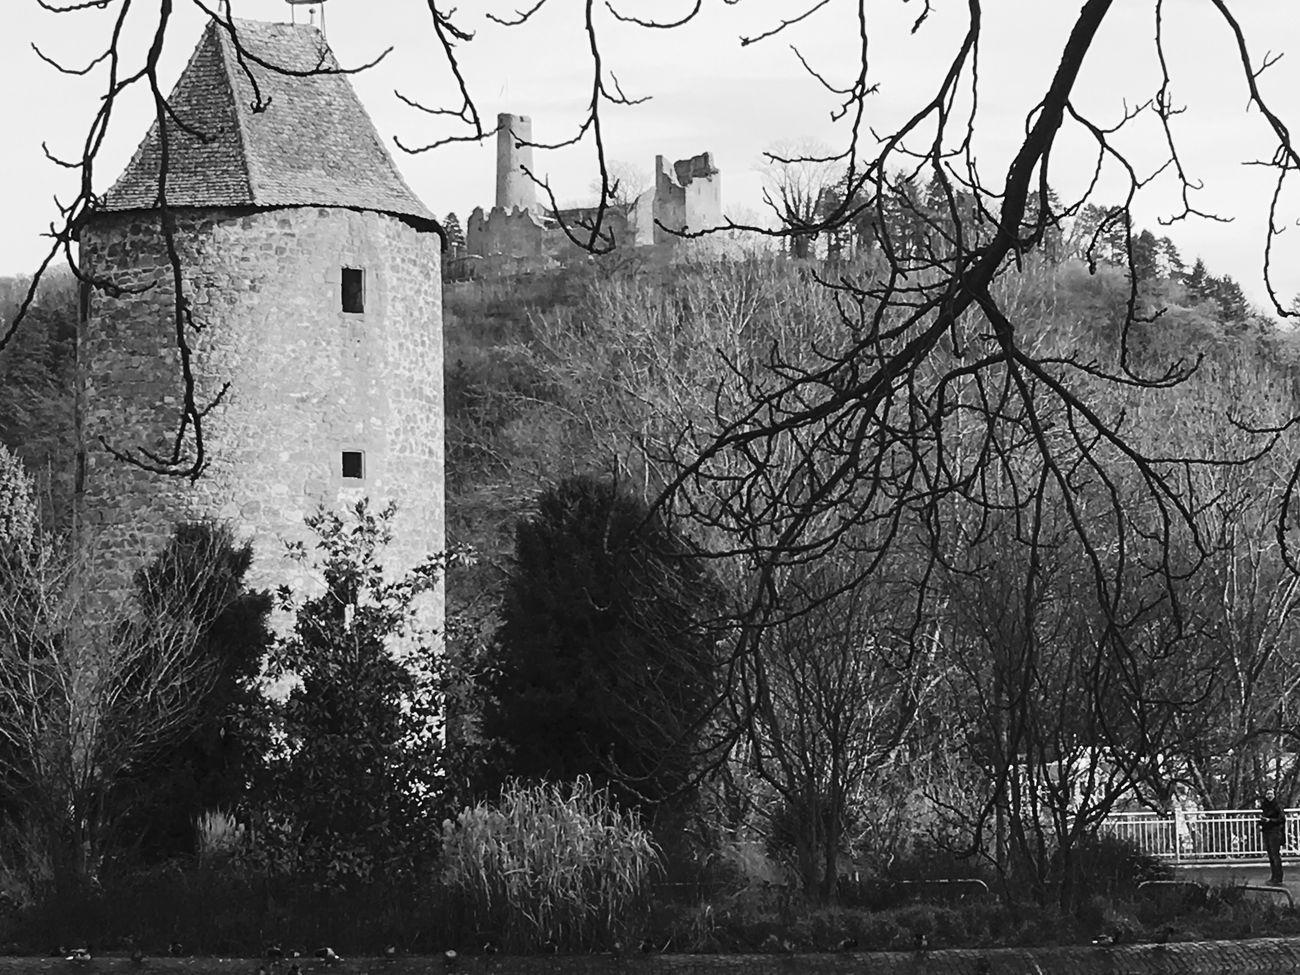 Weinheim Blackandwhite Photography Castle Castle Ruin First Eyem Photo Nature Nature_collection Blackandwhite Showcase: January